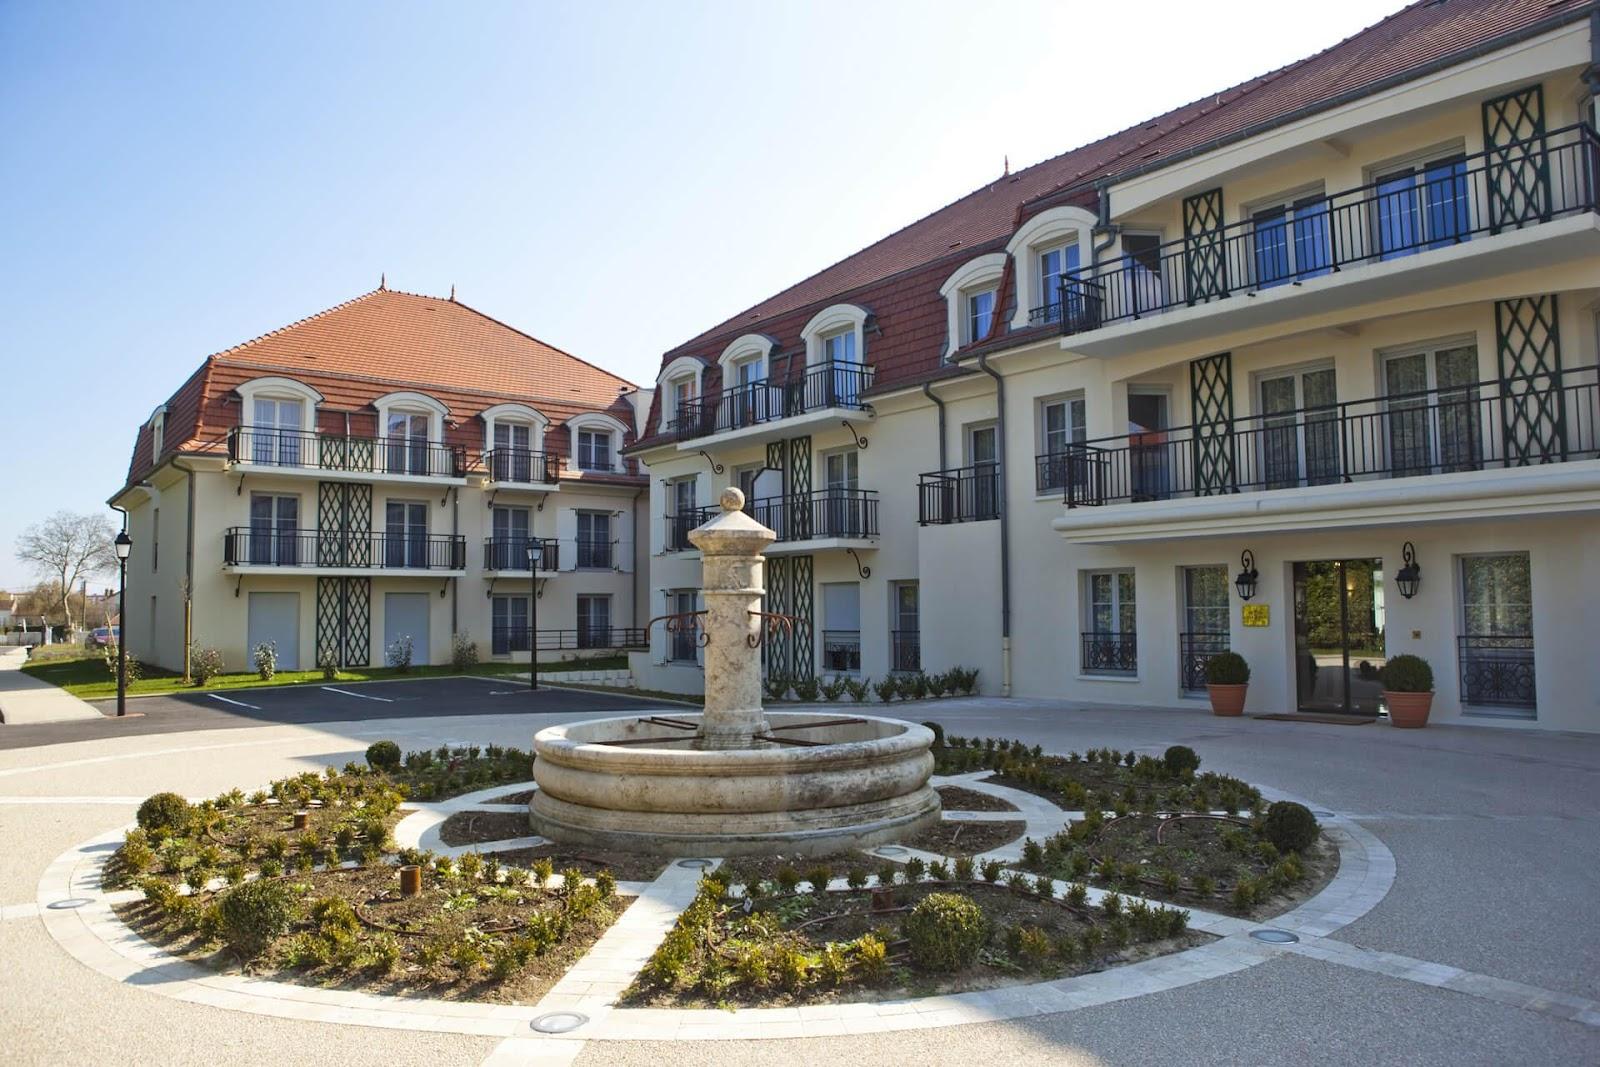 Résidence sénior Beaune - Villa Médicis - Parvi